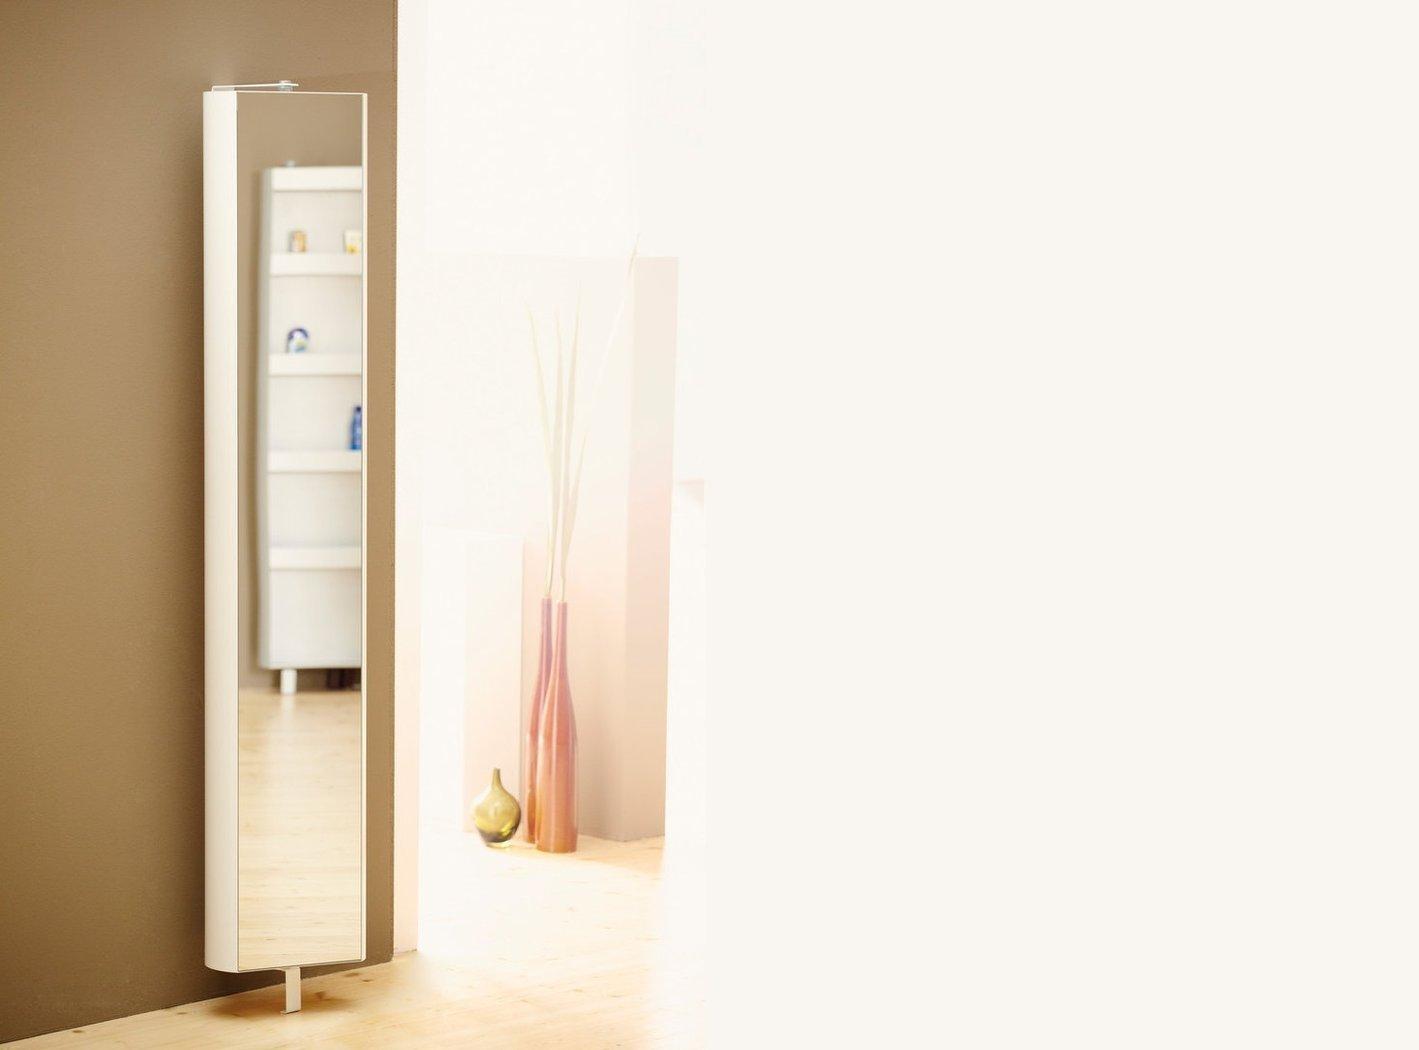 jan kurtz multi tube m garderobe teakwoodstore24. Black Bedroom Furniture Sets. Home Design Ideas